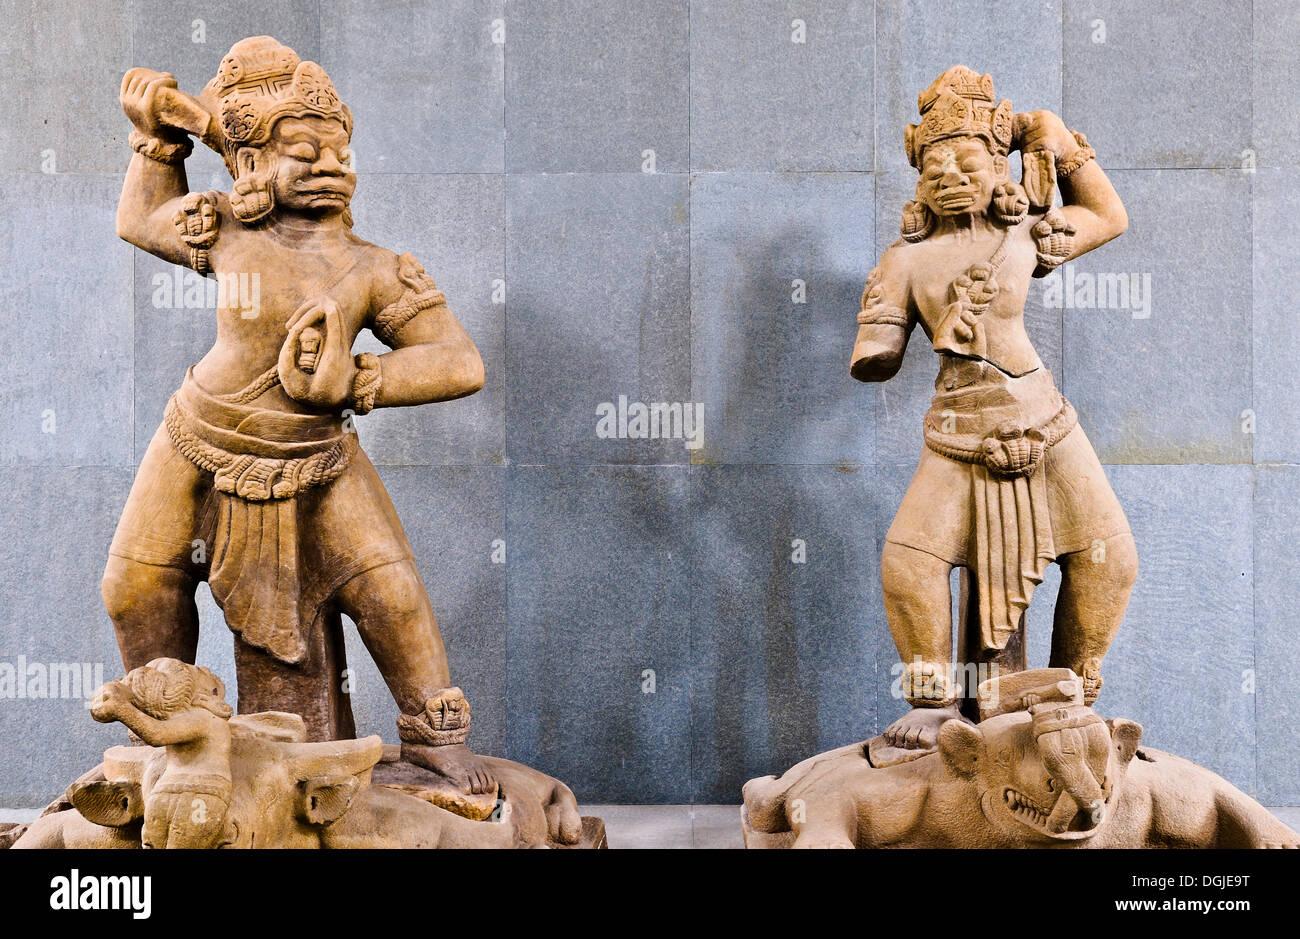 Estatuas de Dvarapala, semidiós que guarda la entrada, Museo Cham, Da Nang, Vietnam, Sudeste de Asia Imagen De Stock